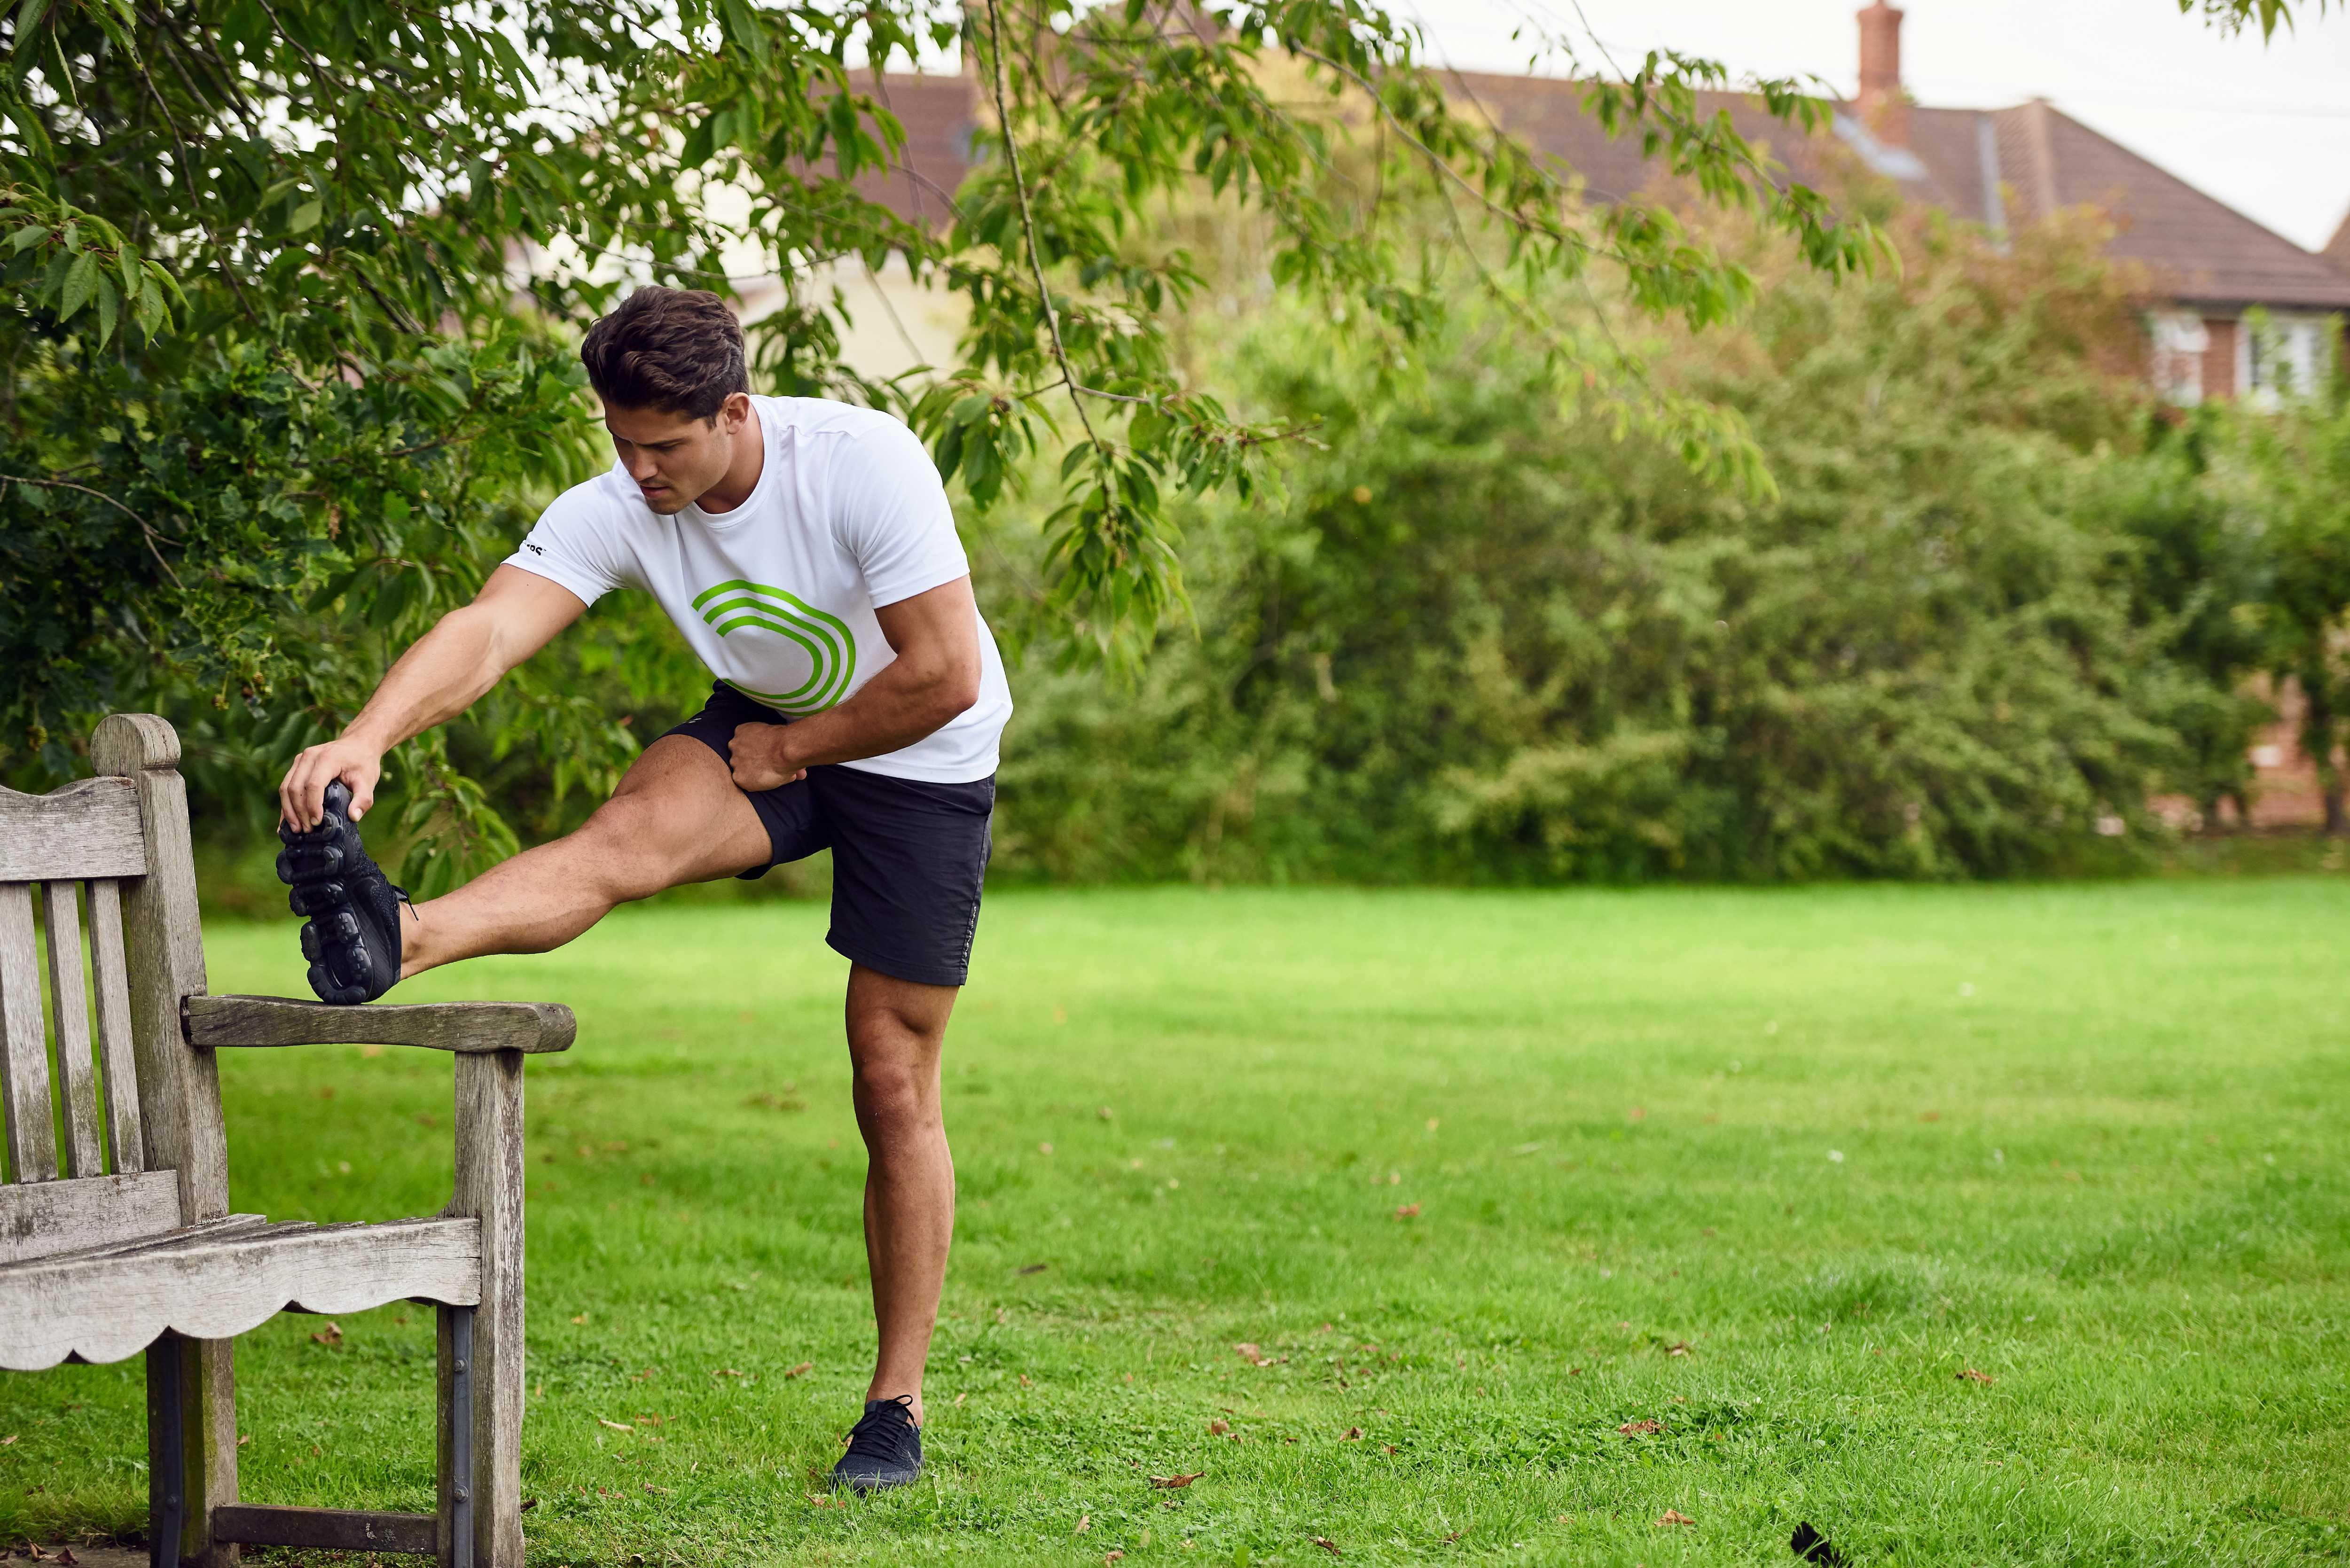 Semaine 2 : Full body Programme summer – Musculation et perte de poids : Débutant